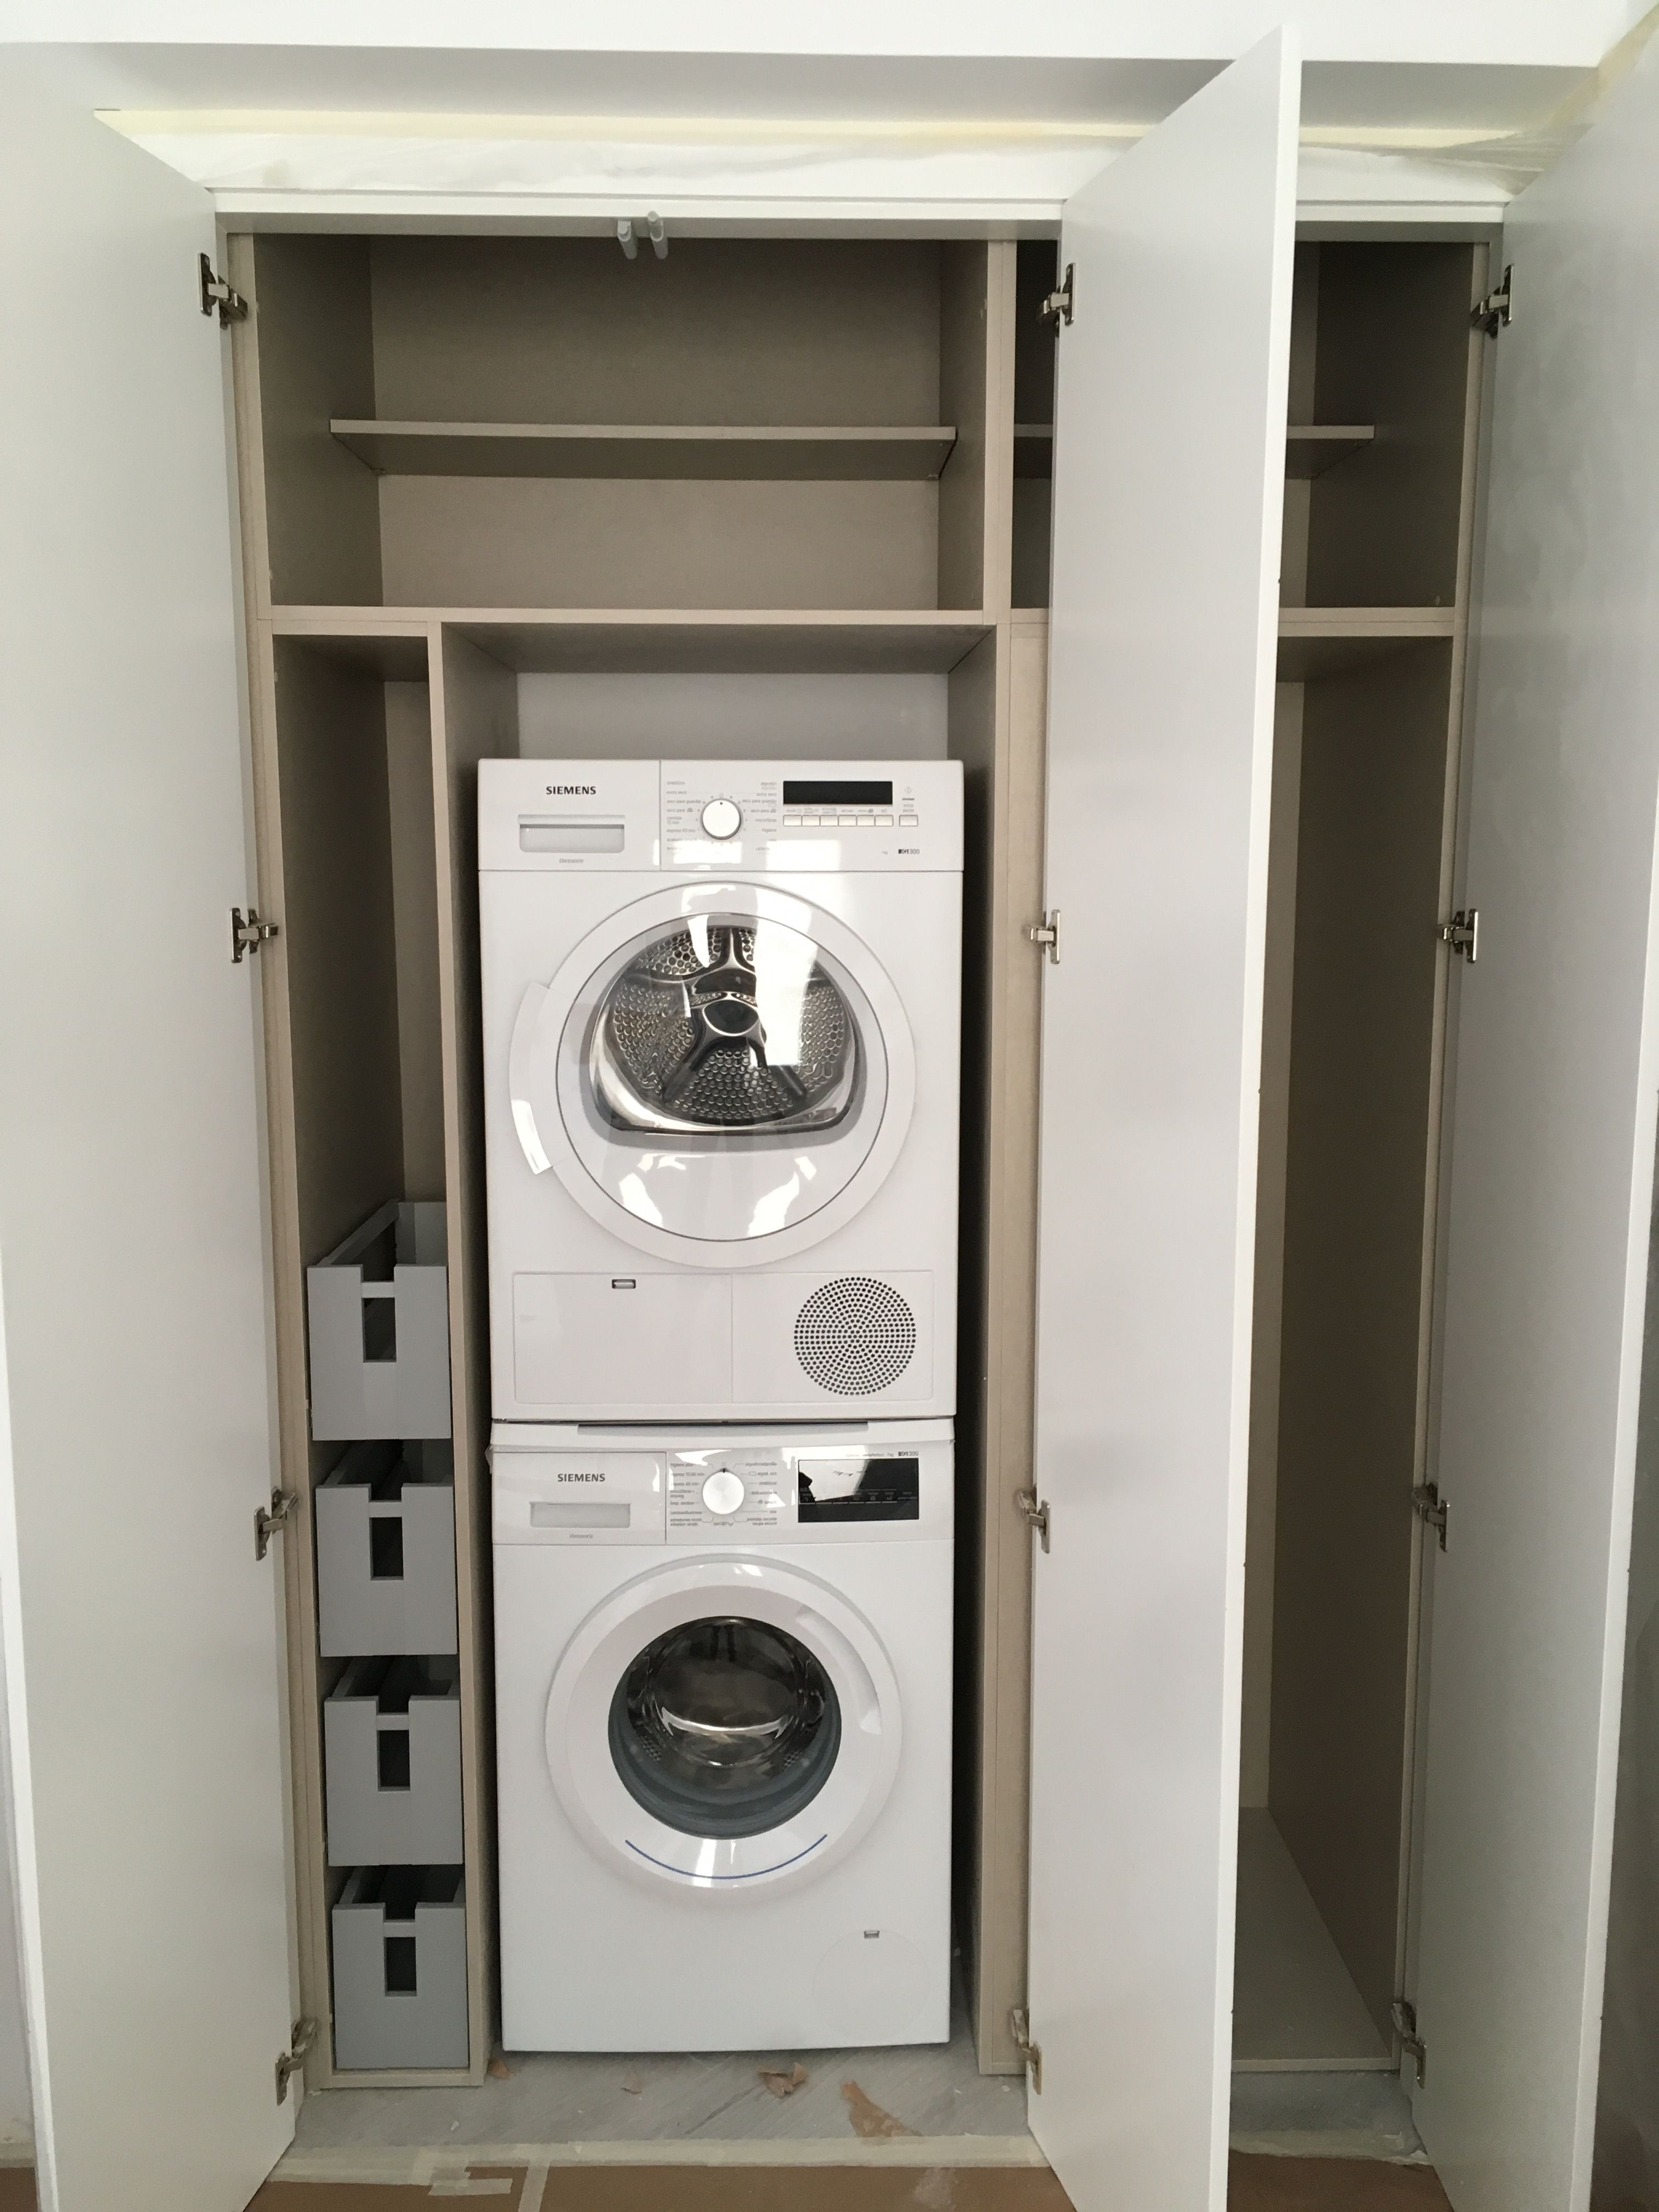 Armario para lavadora elegant im genes mueble para - Armario lavadora exterior ...